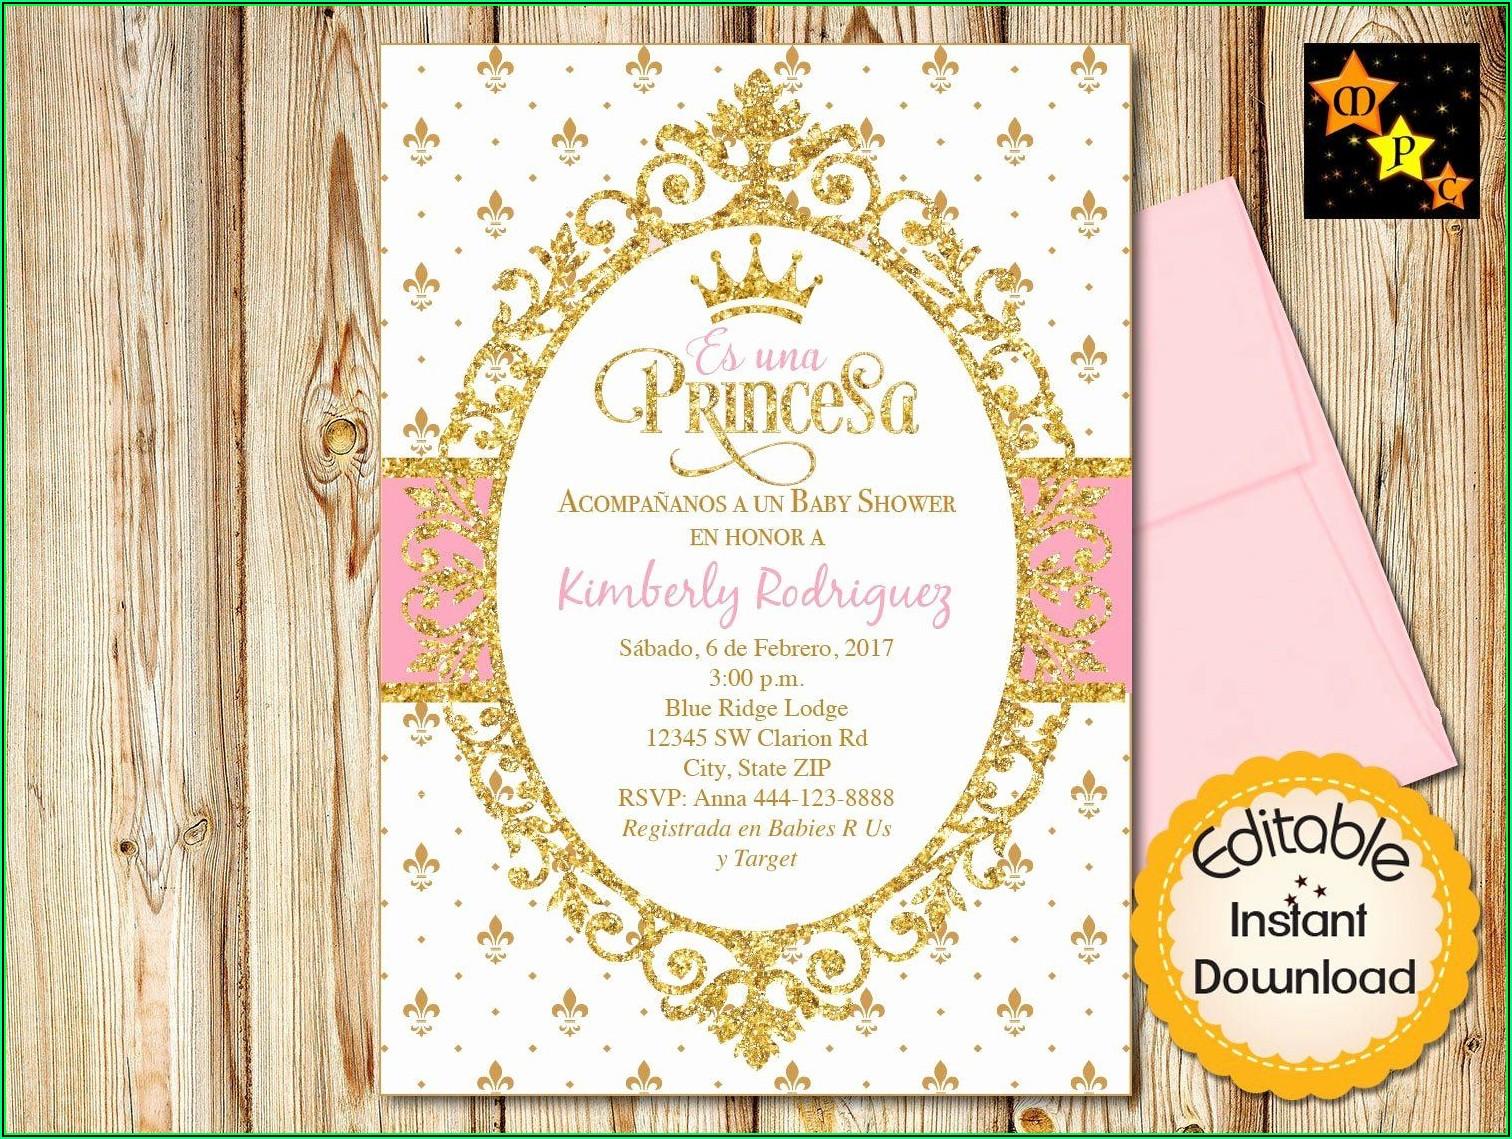 Princess Baby Shower Invitations Templates